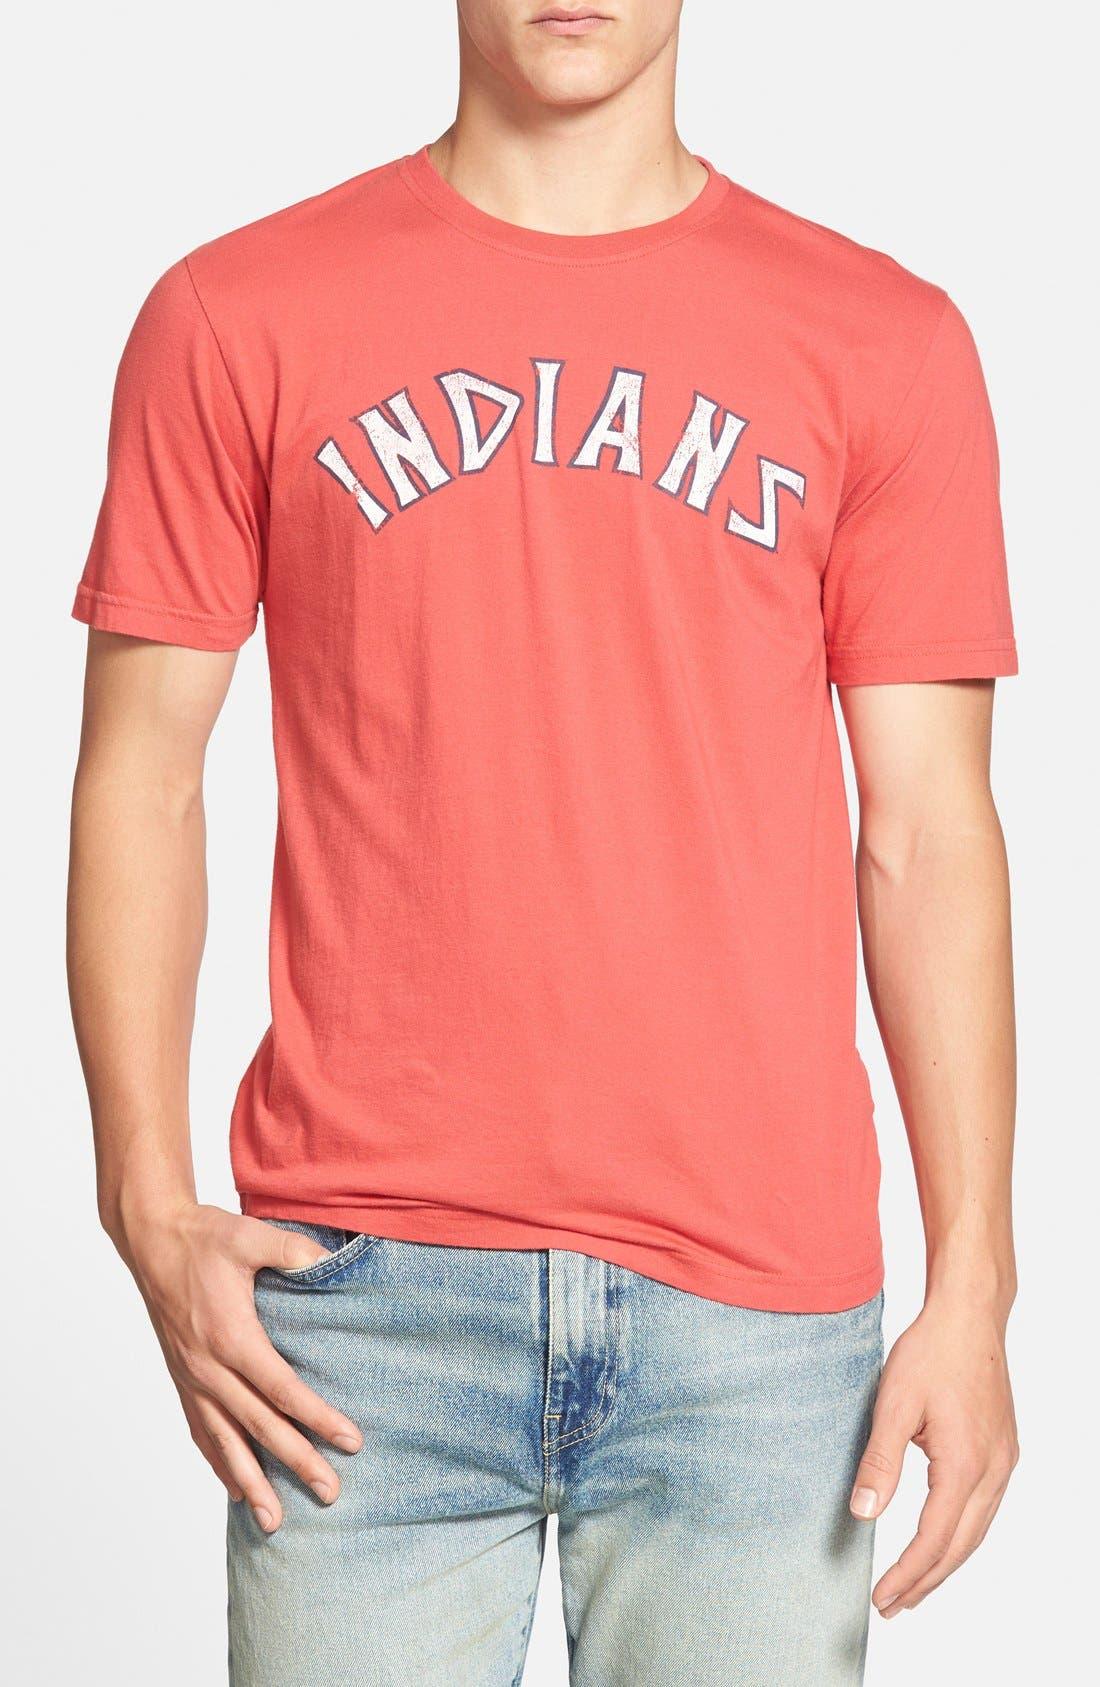 'Cleveland Indians - Brass Tacks' T-Shirt,                             Main thumbnail 1, color,                             Red